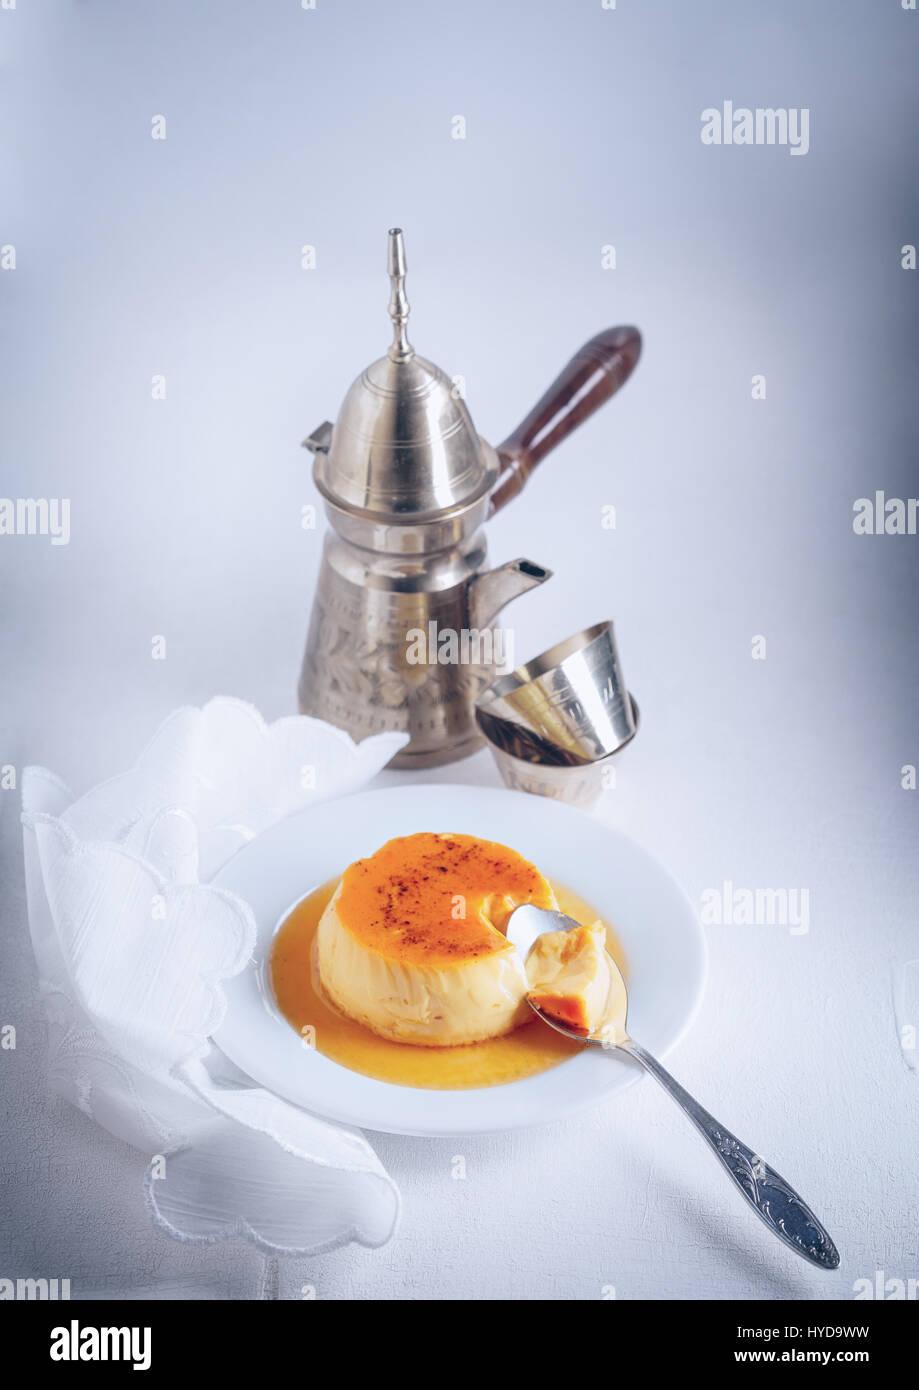 Homemade Creme Caramel - Stock Image